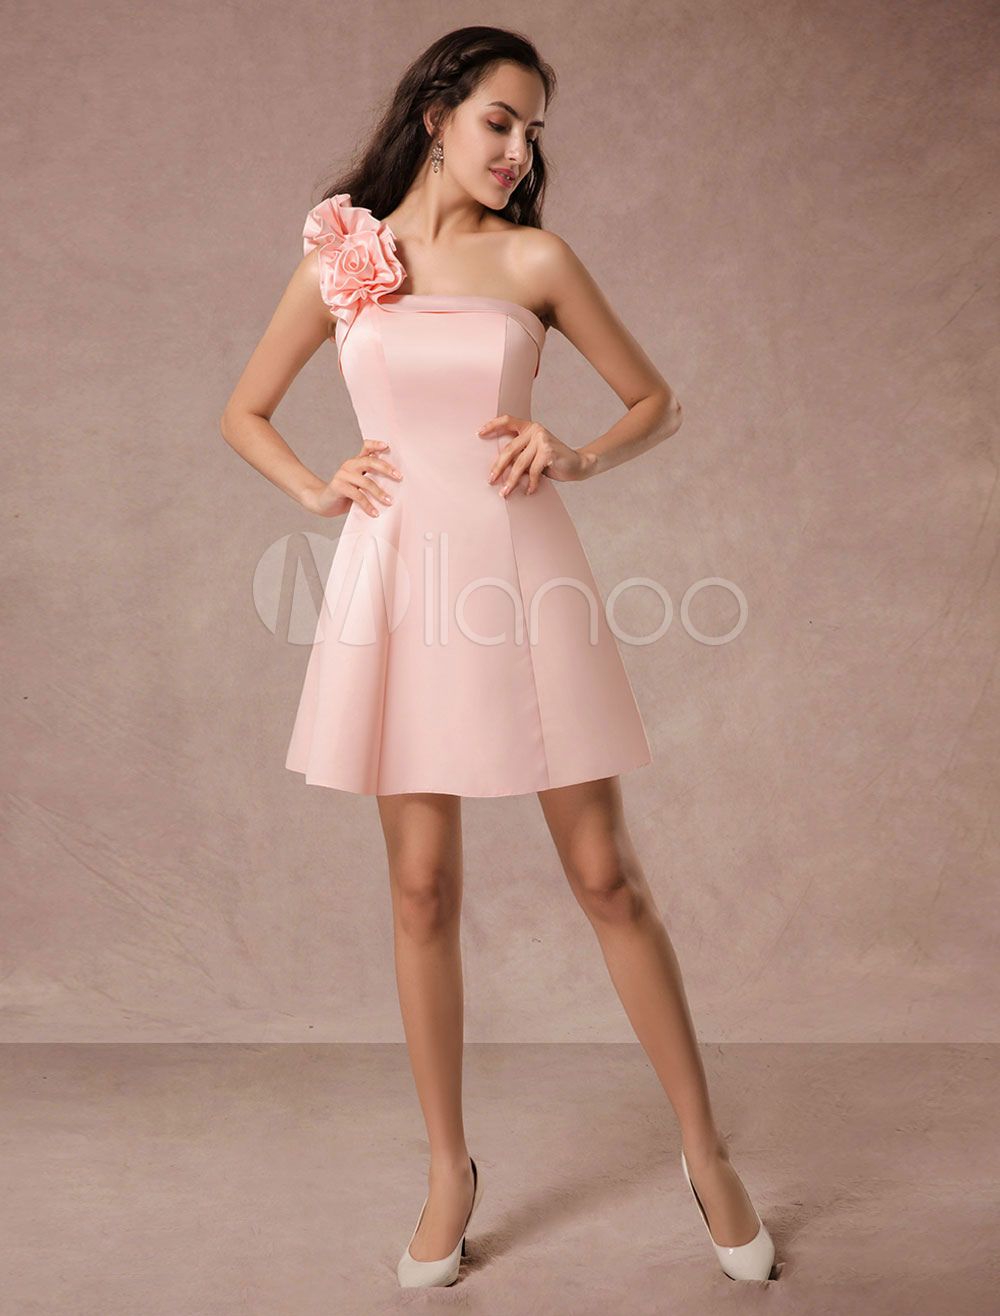 Short Prom Dress Pink Satin One-shoulder Ruffles A-line Homecoming Dress (Wedding Prom Dresses) photo